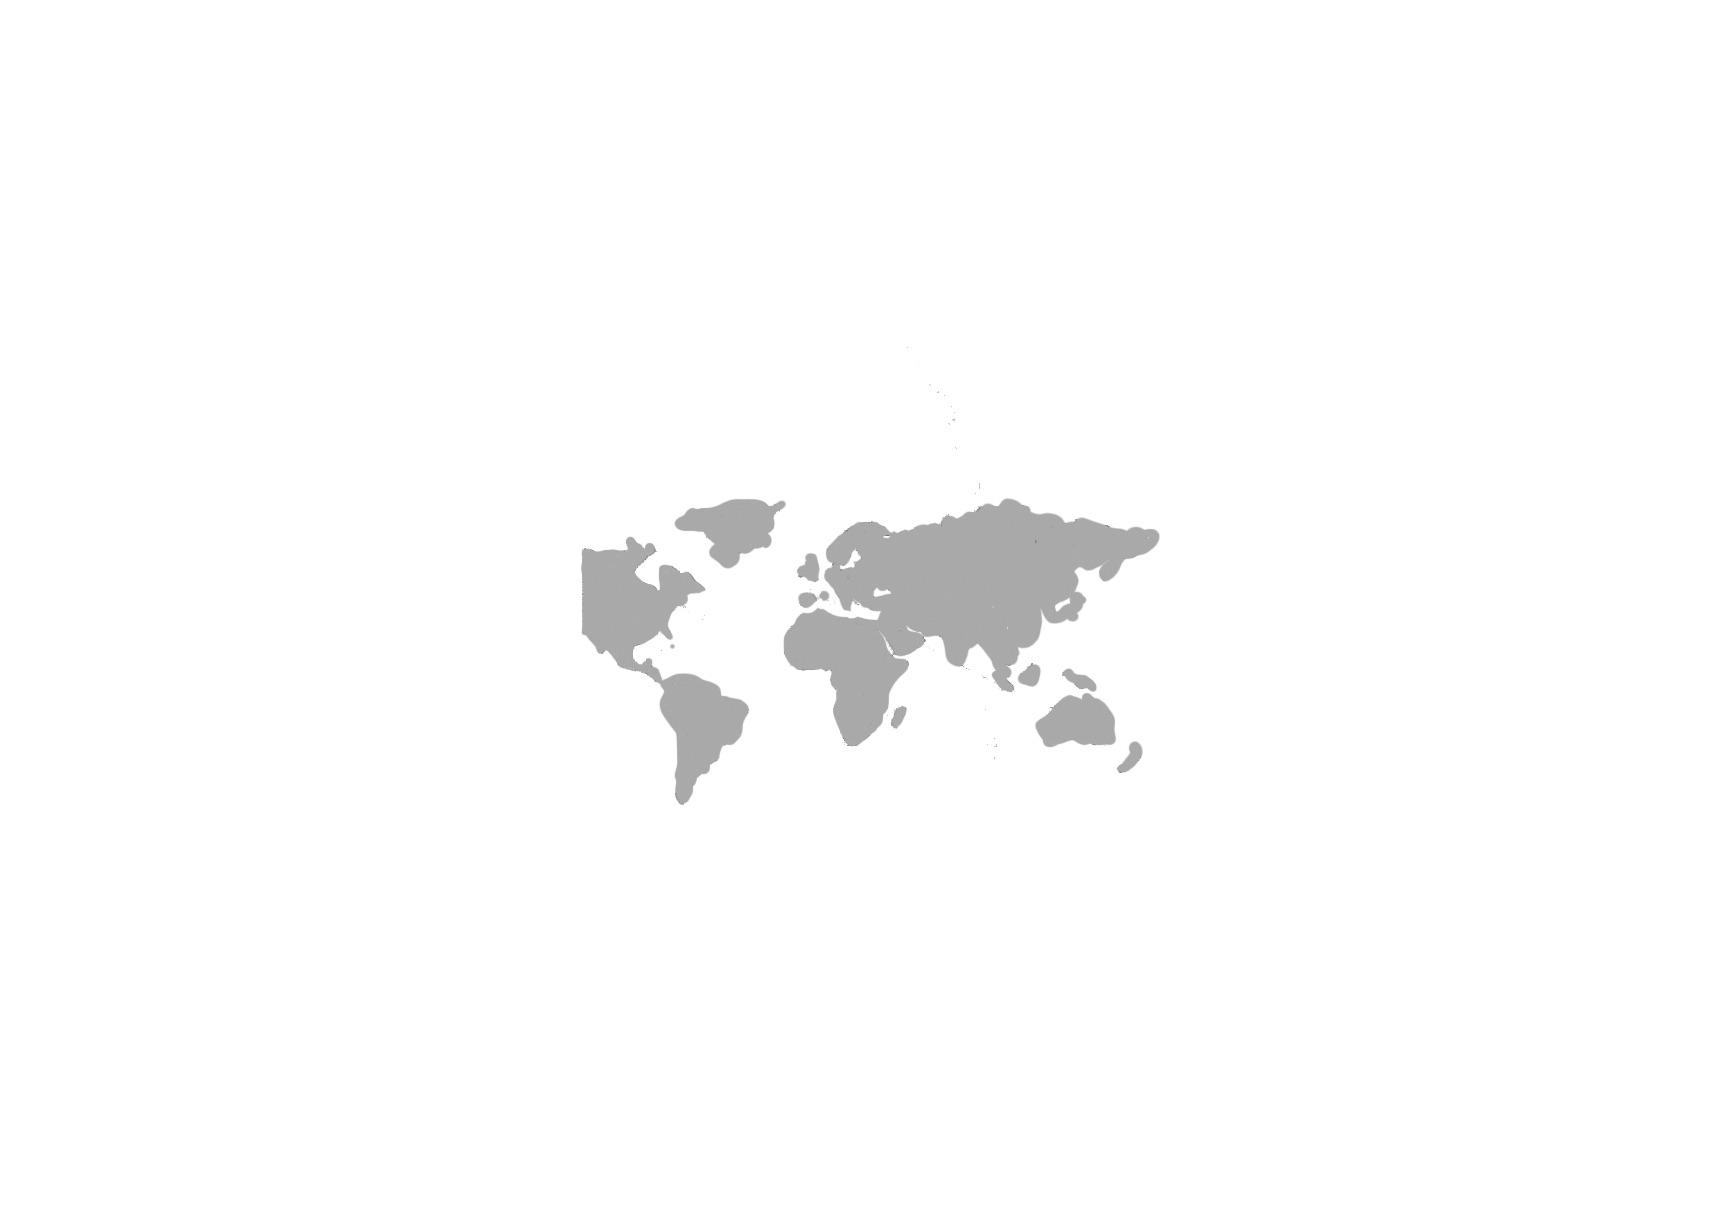 grayscale world map